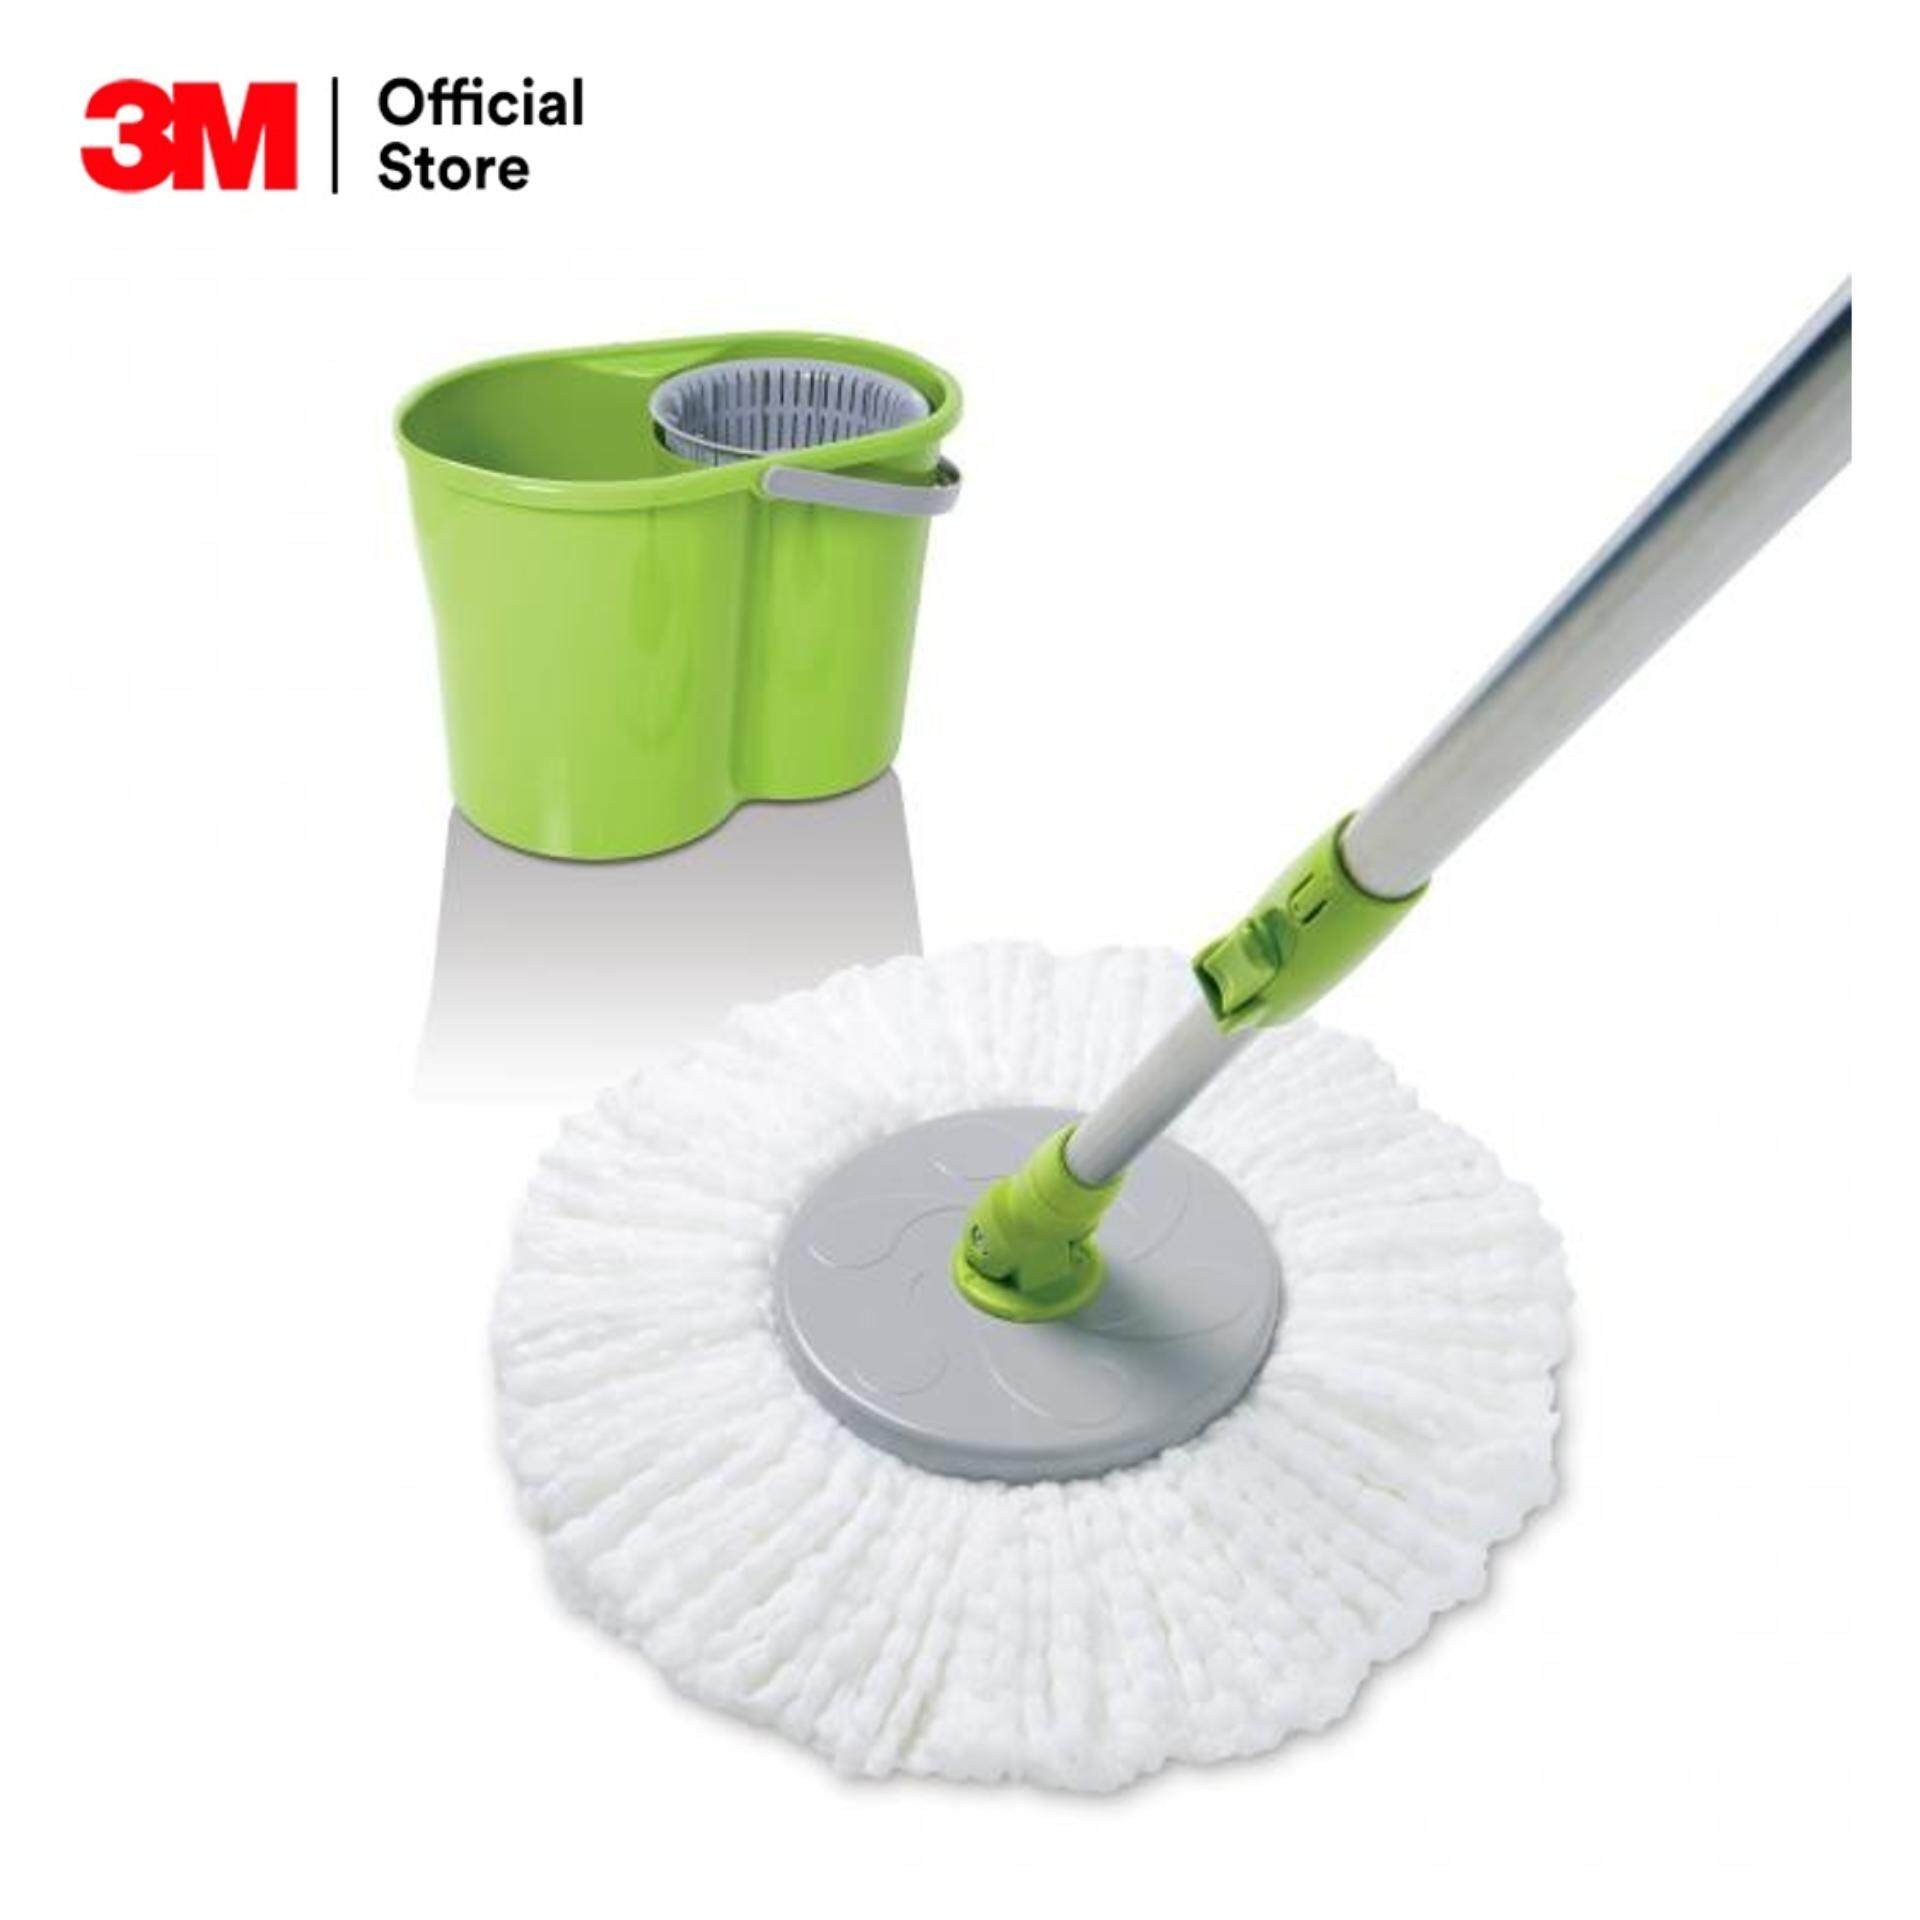 Scotch-Brite Microfiber Mop With Spin Bucket สก๊อตช์-ไบรต์® ชุดไม้ถูพื้นไมโครไฟเบอร์พร้อมถังปั่นแห้ง.